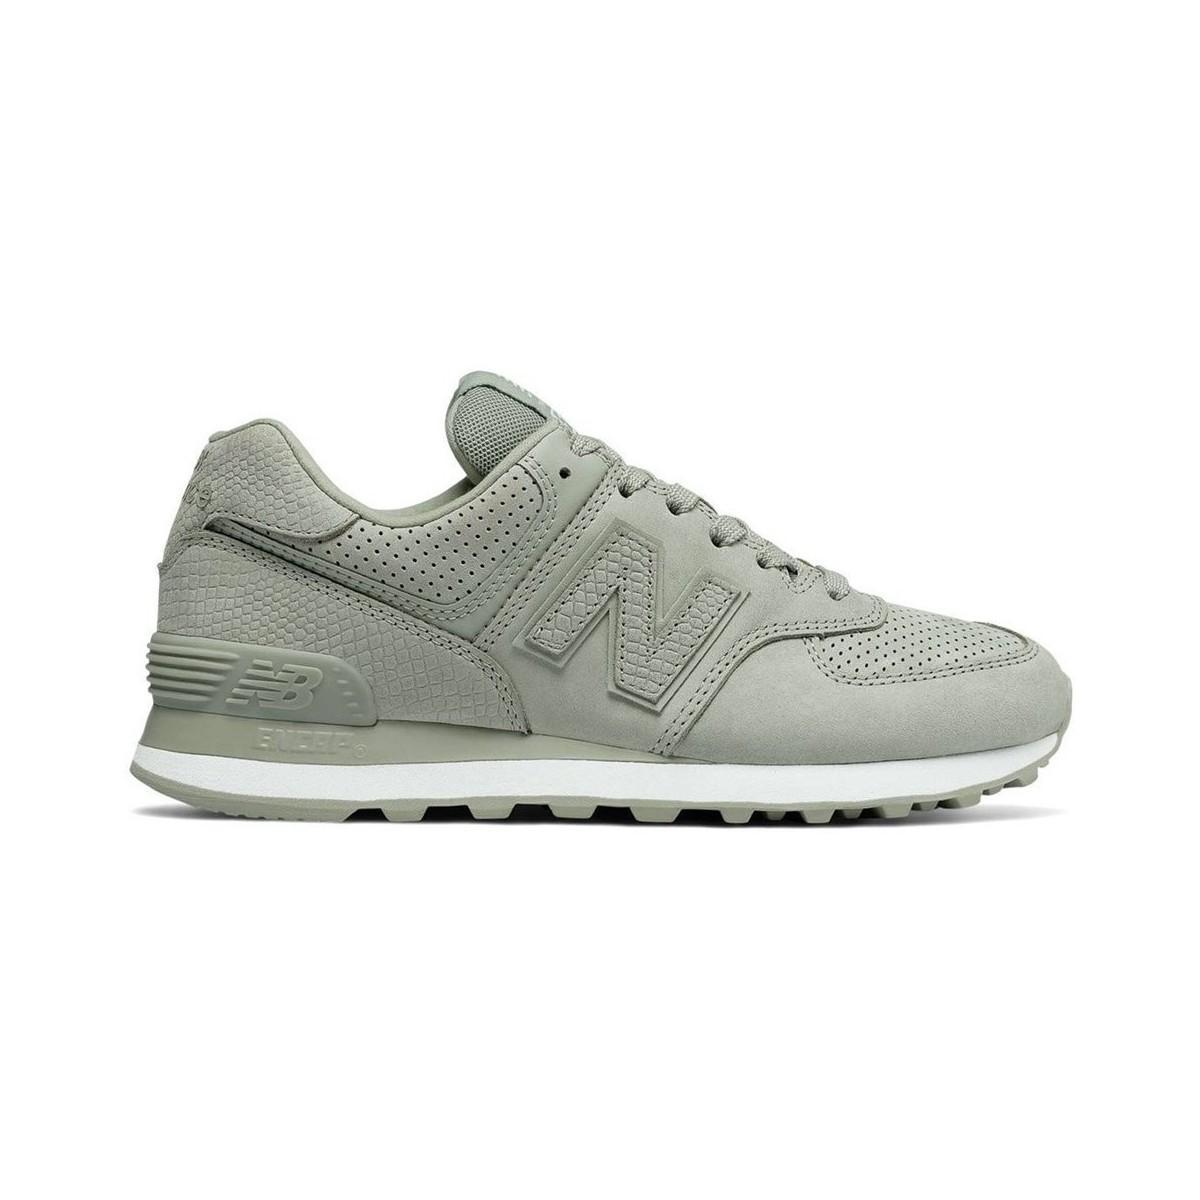 2322e5ed3b13 New Balance Wl574urv Women s Shoes (trainers) In Multicolour in Gray ...